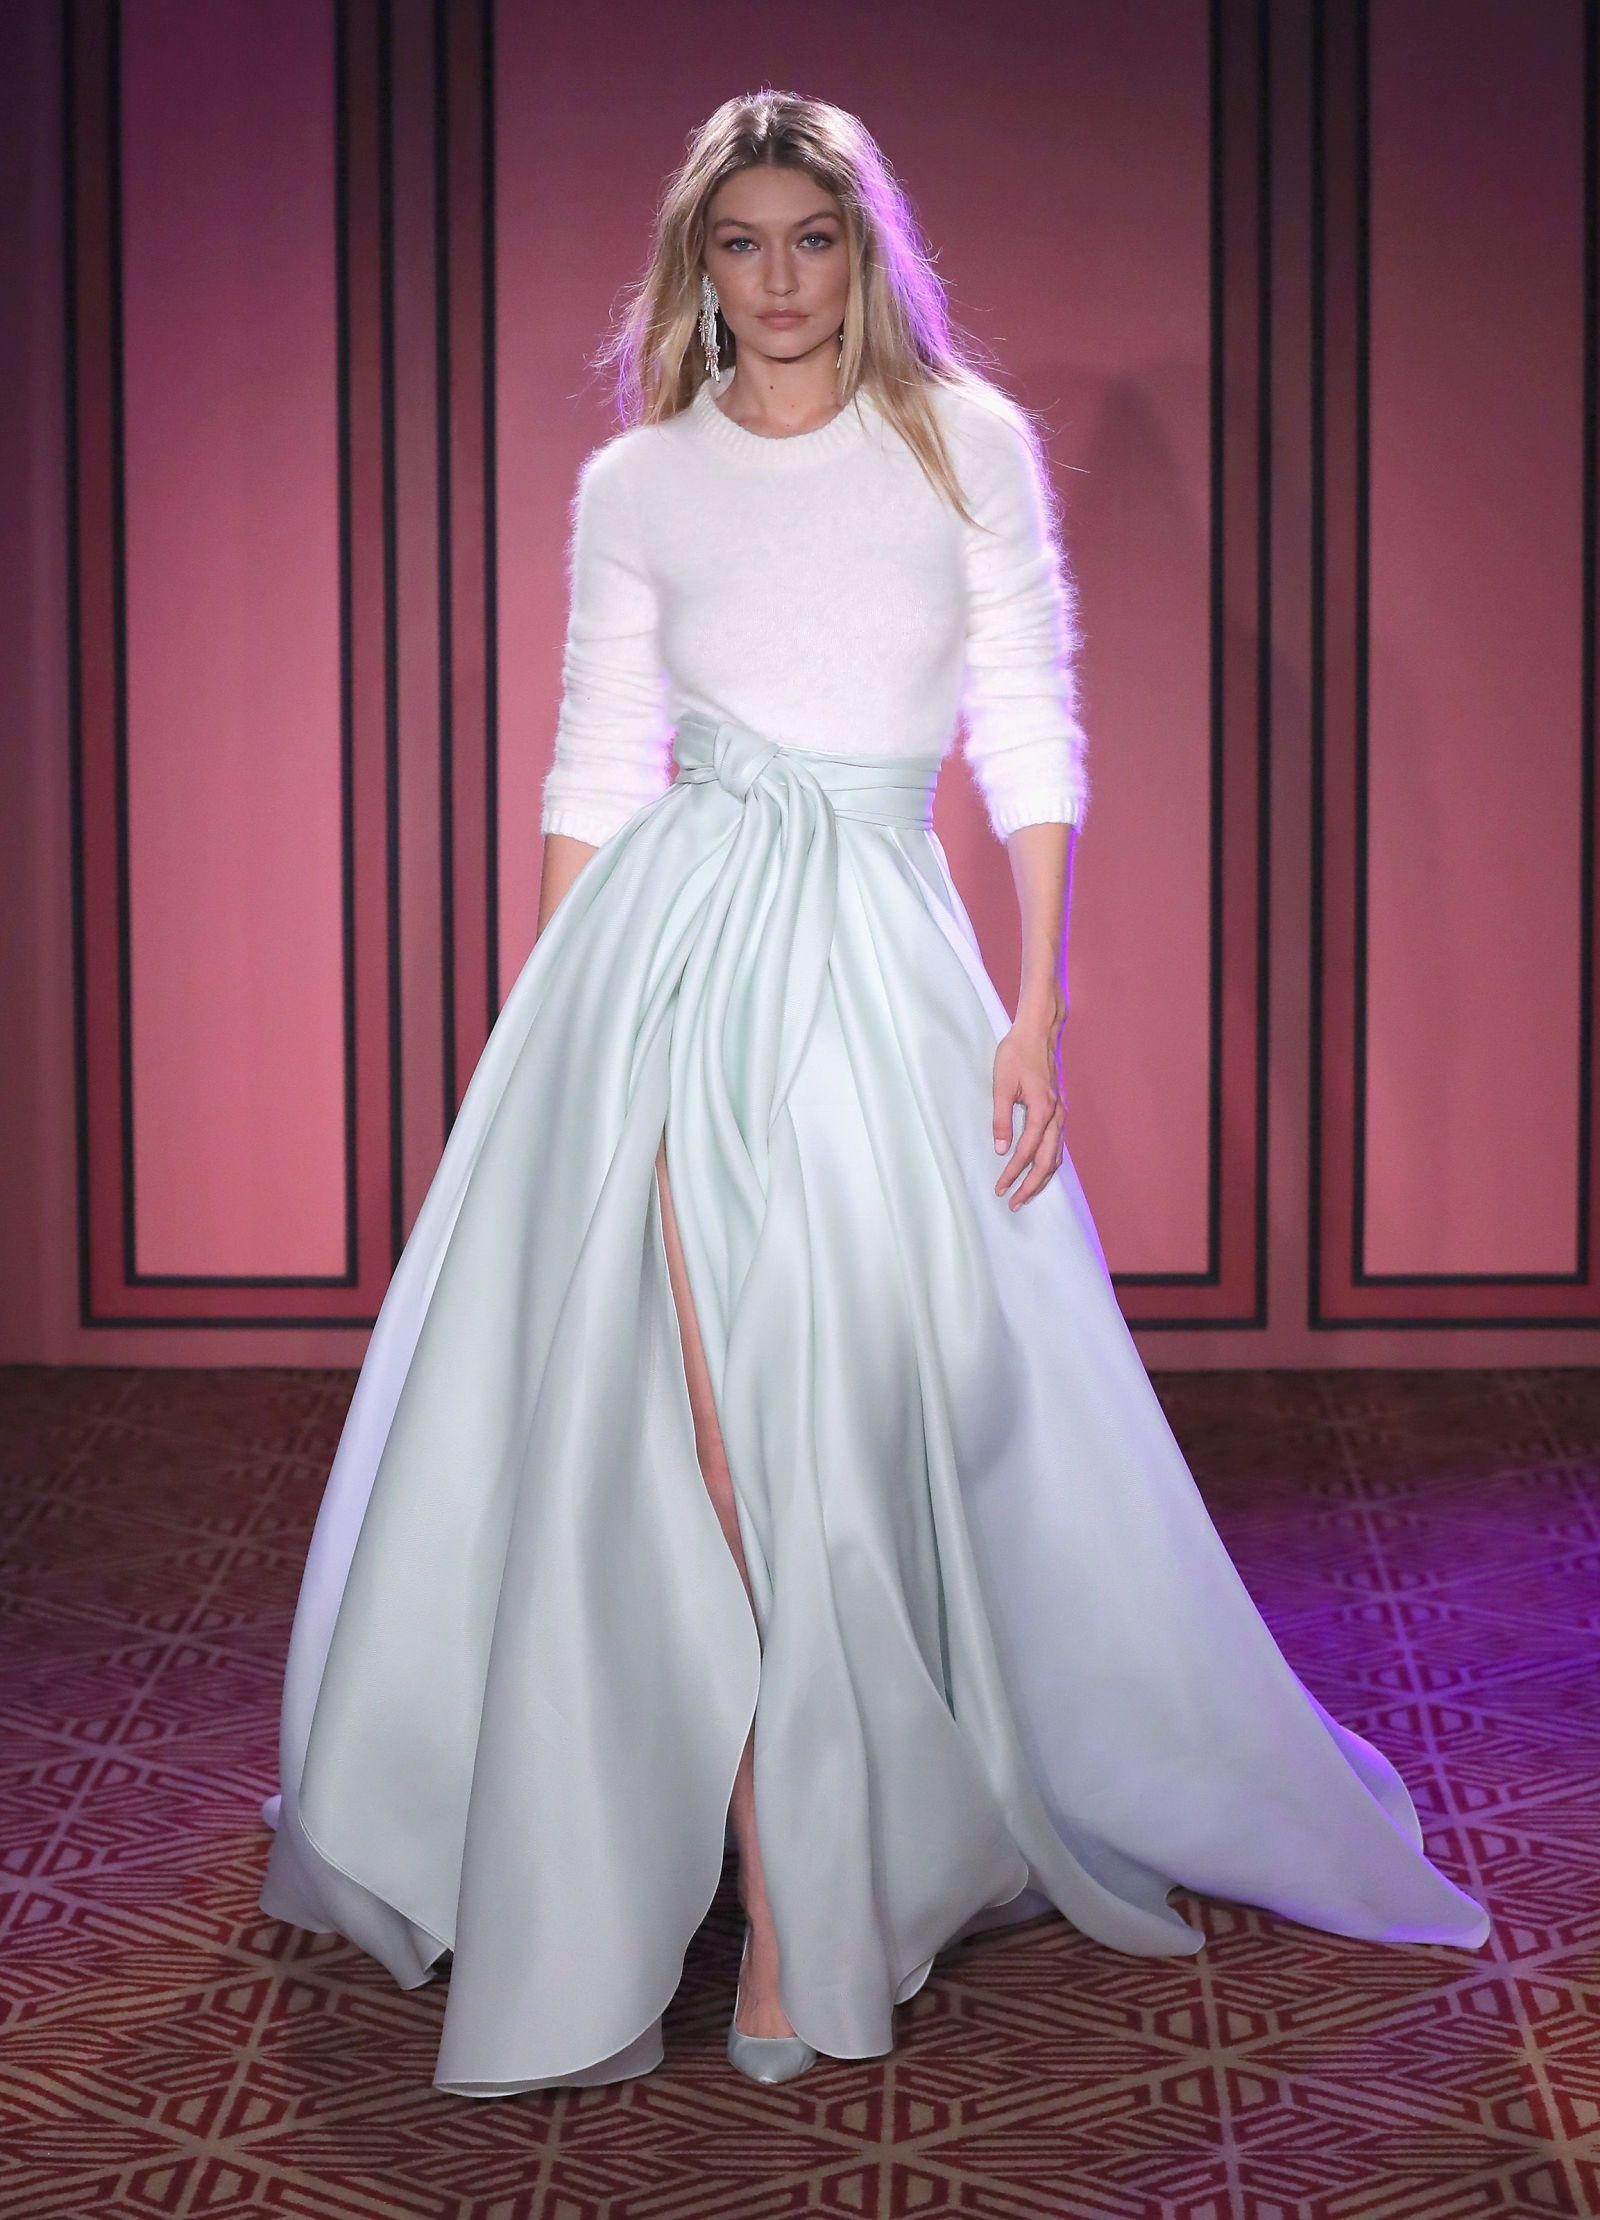 Gigi Hadid Watch Spring Summer 2018 All Her Runway Earances From Nyfw To Pfw